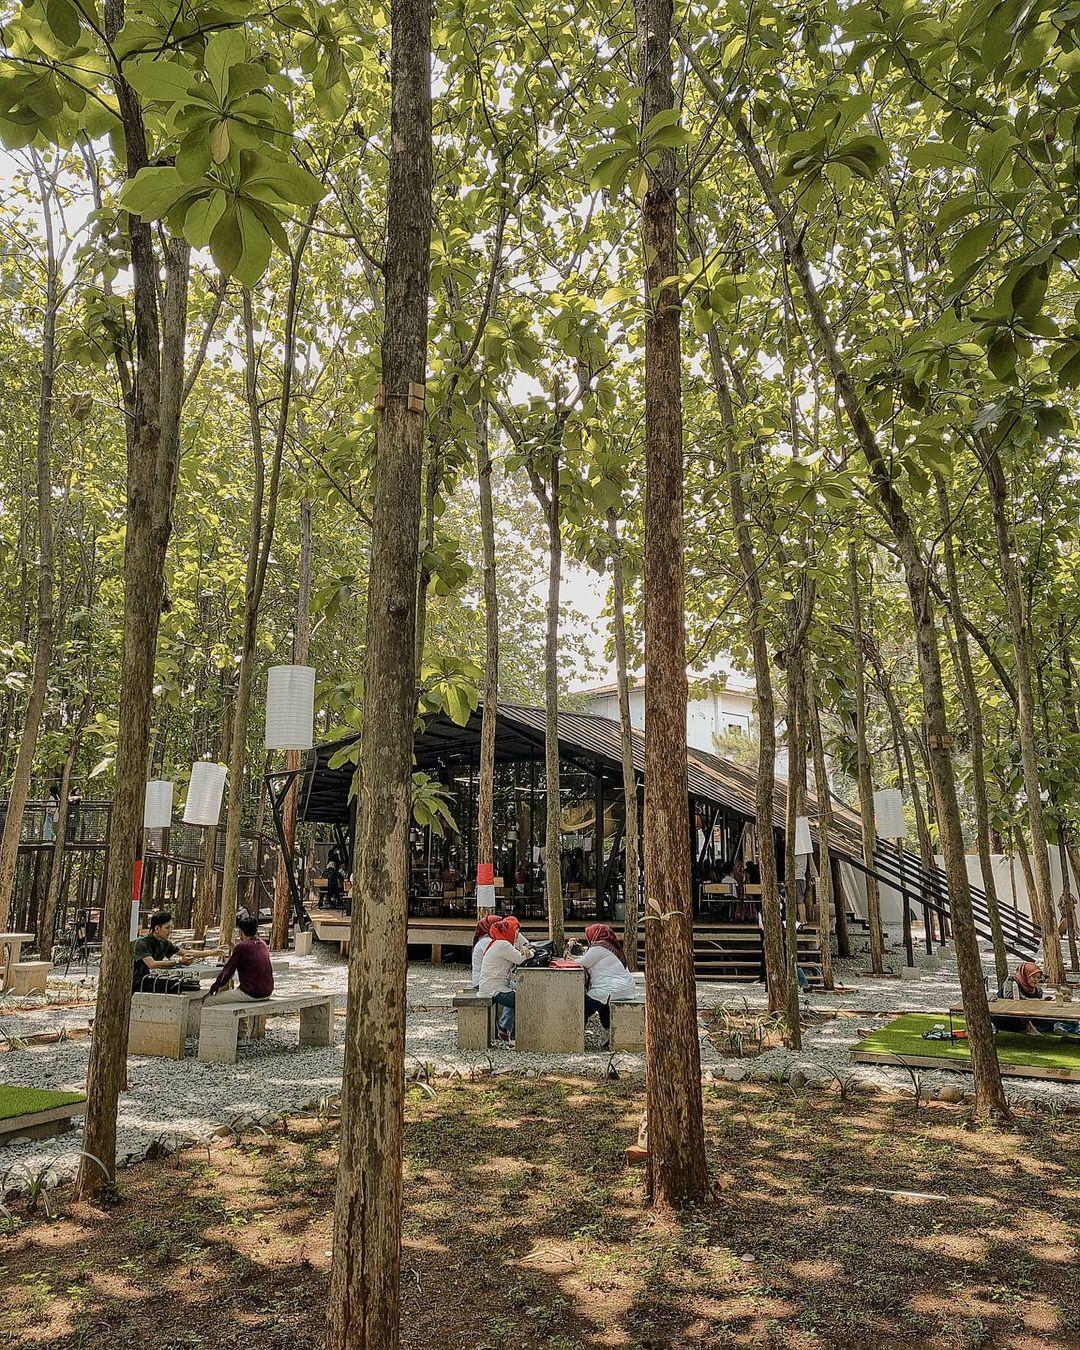 Hutan Jati Cafe & Gelato